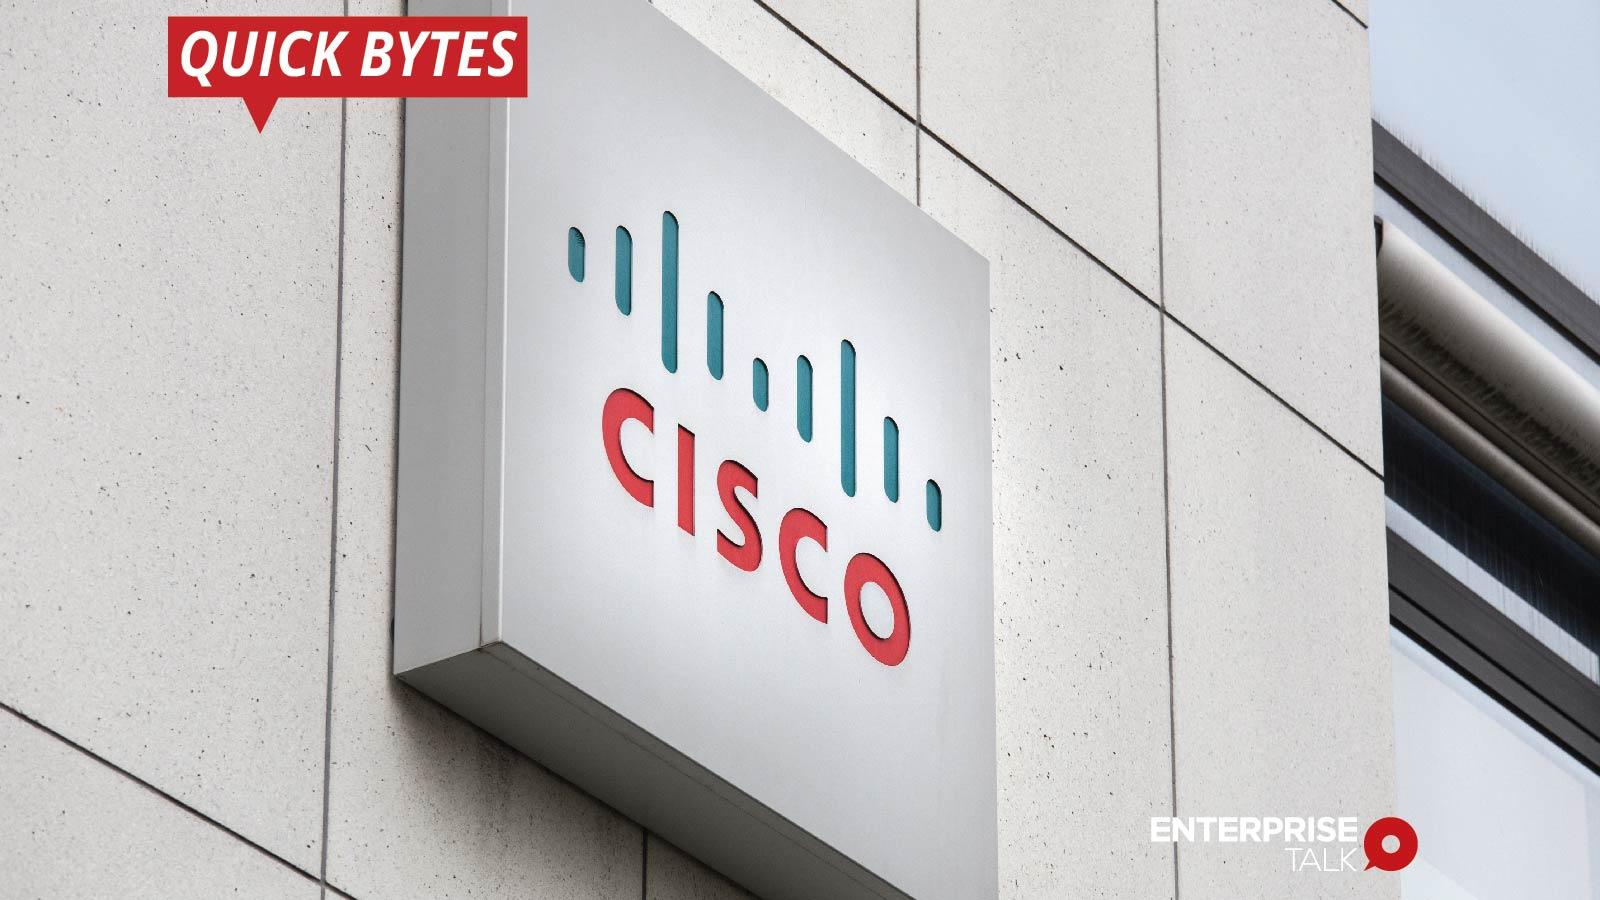 Cisco has a _5-billion plan for networks building_ deployments